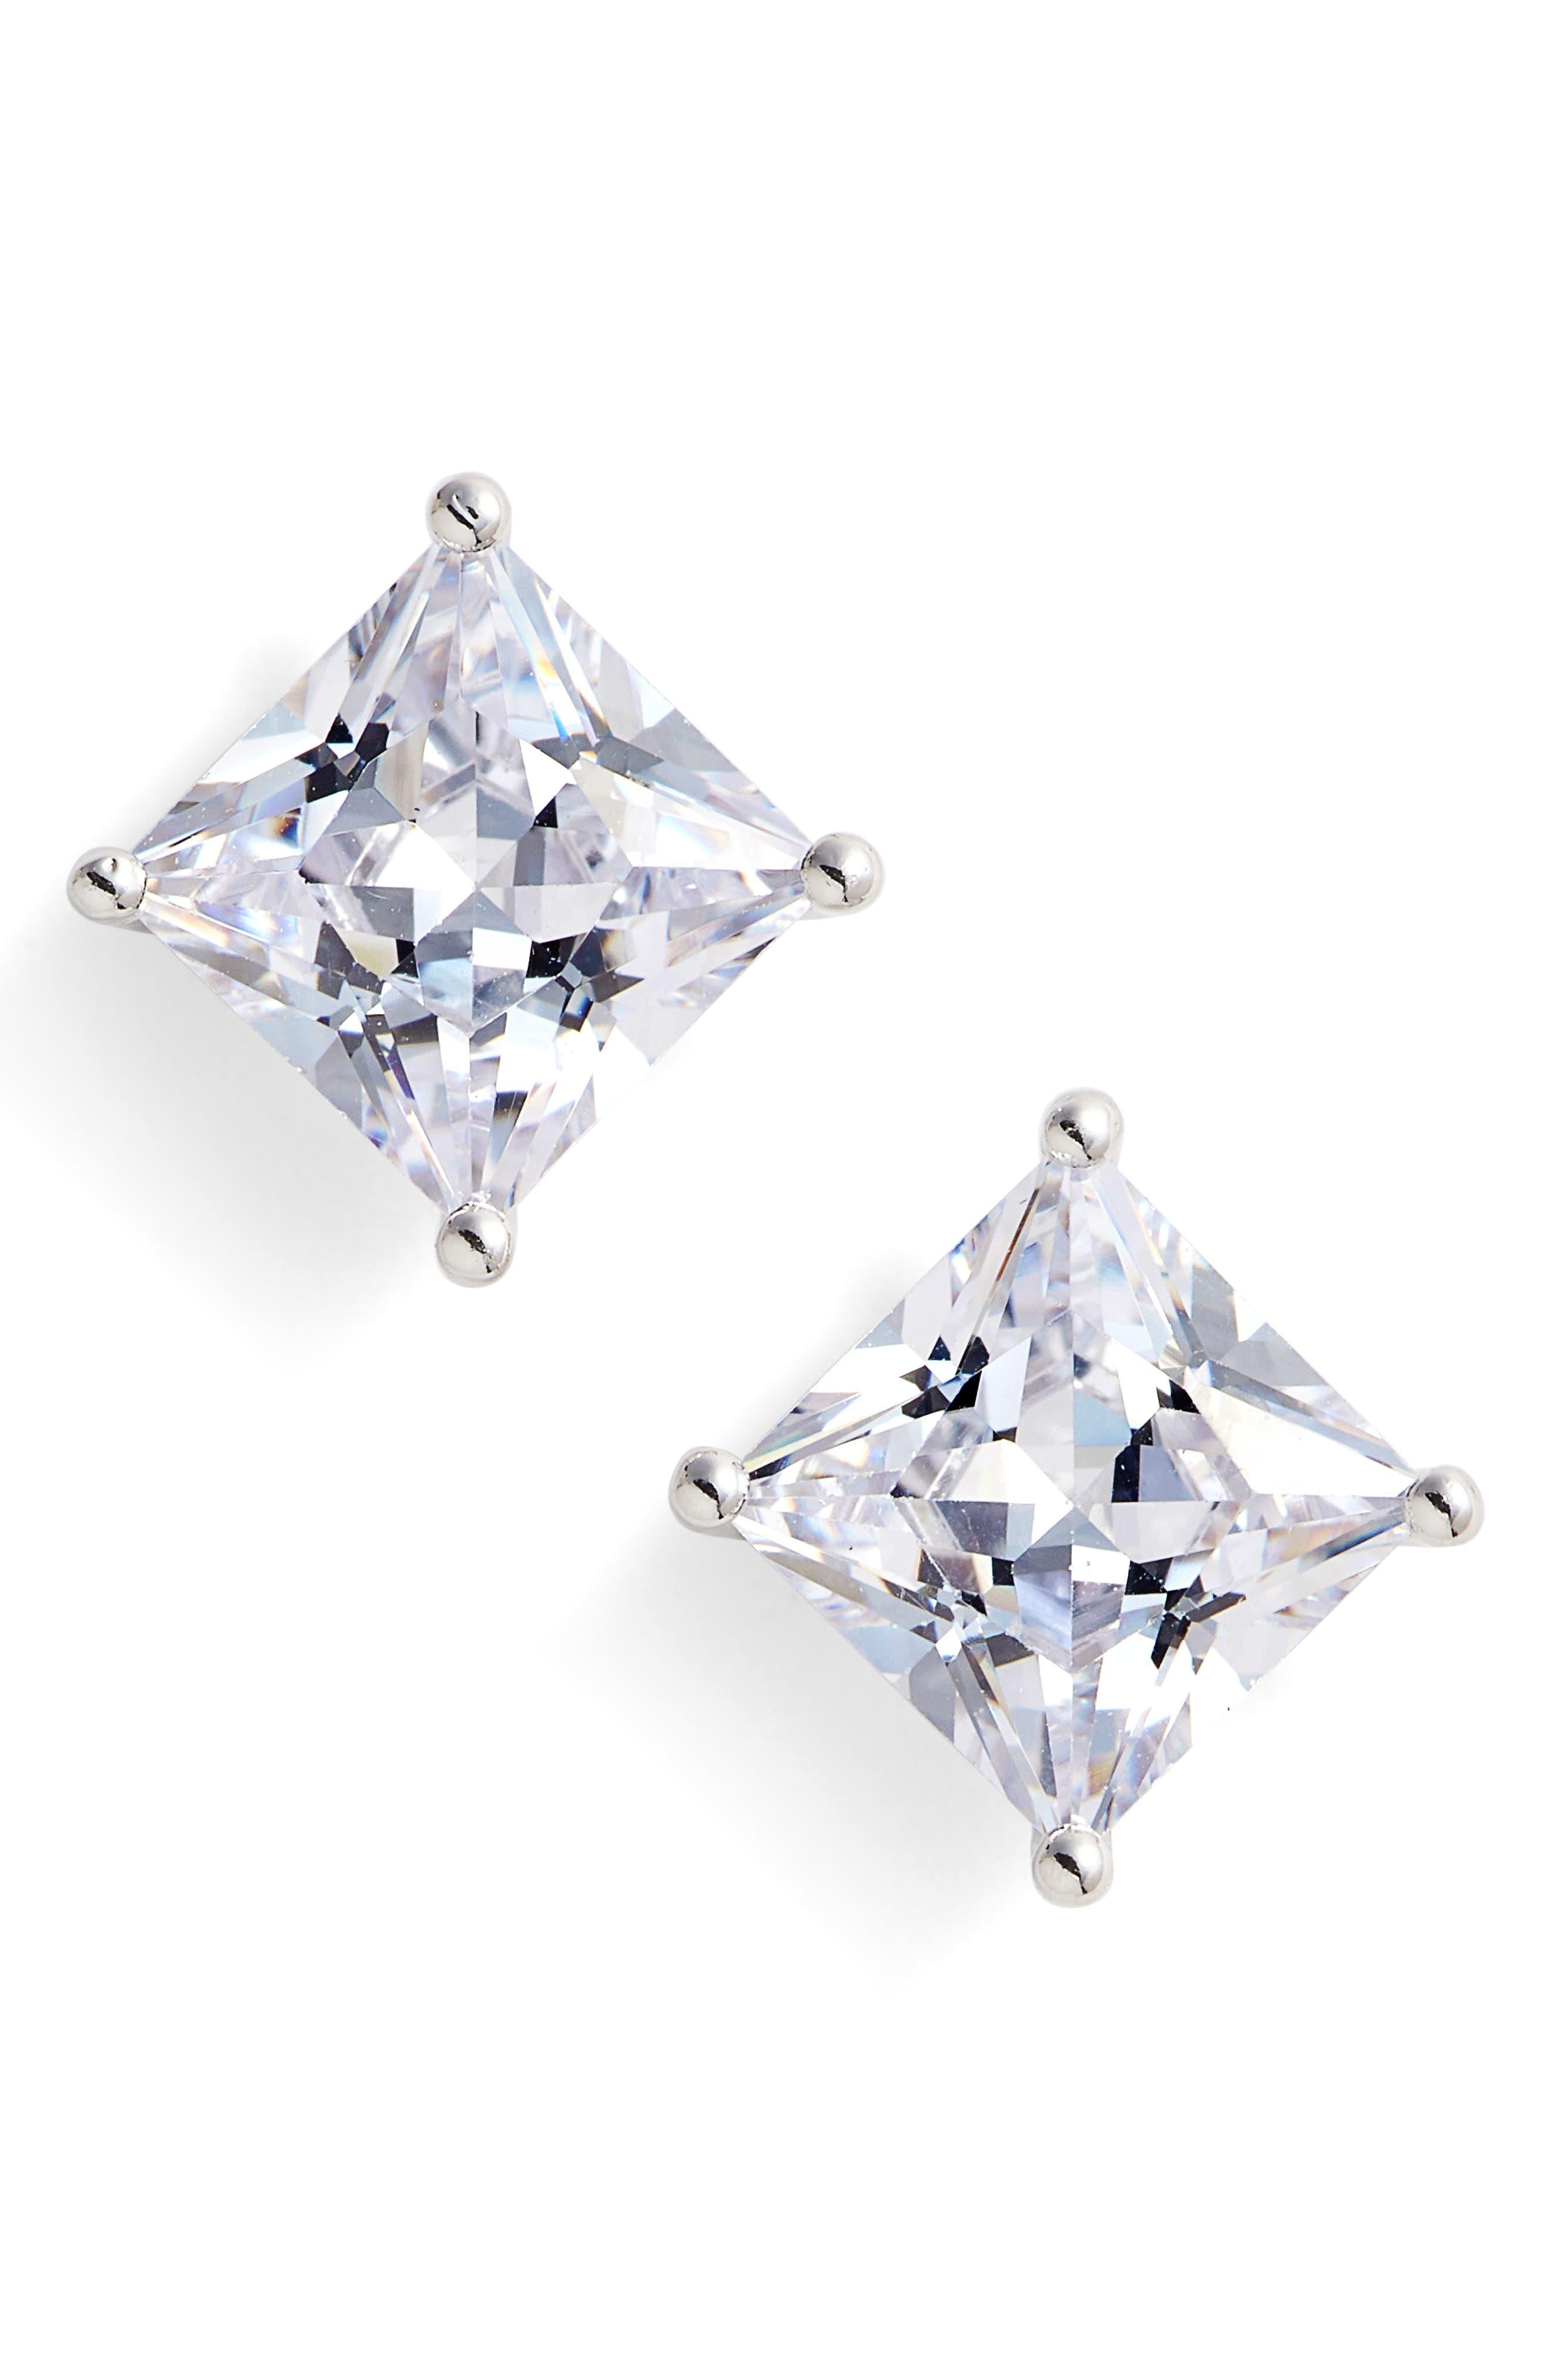 6ct tw Princess Cut Cubic Zirconia Stud Earrings,                             Main thumbnail 1, color,                             Platinum